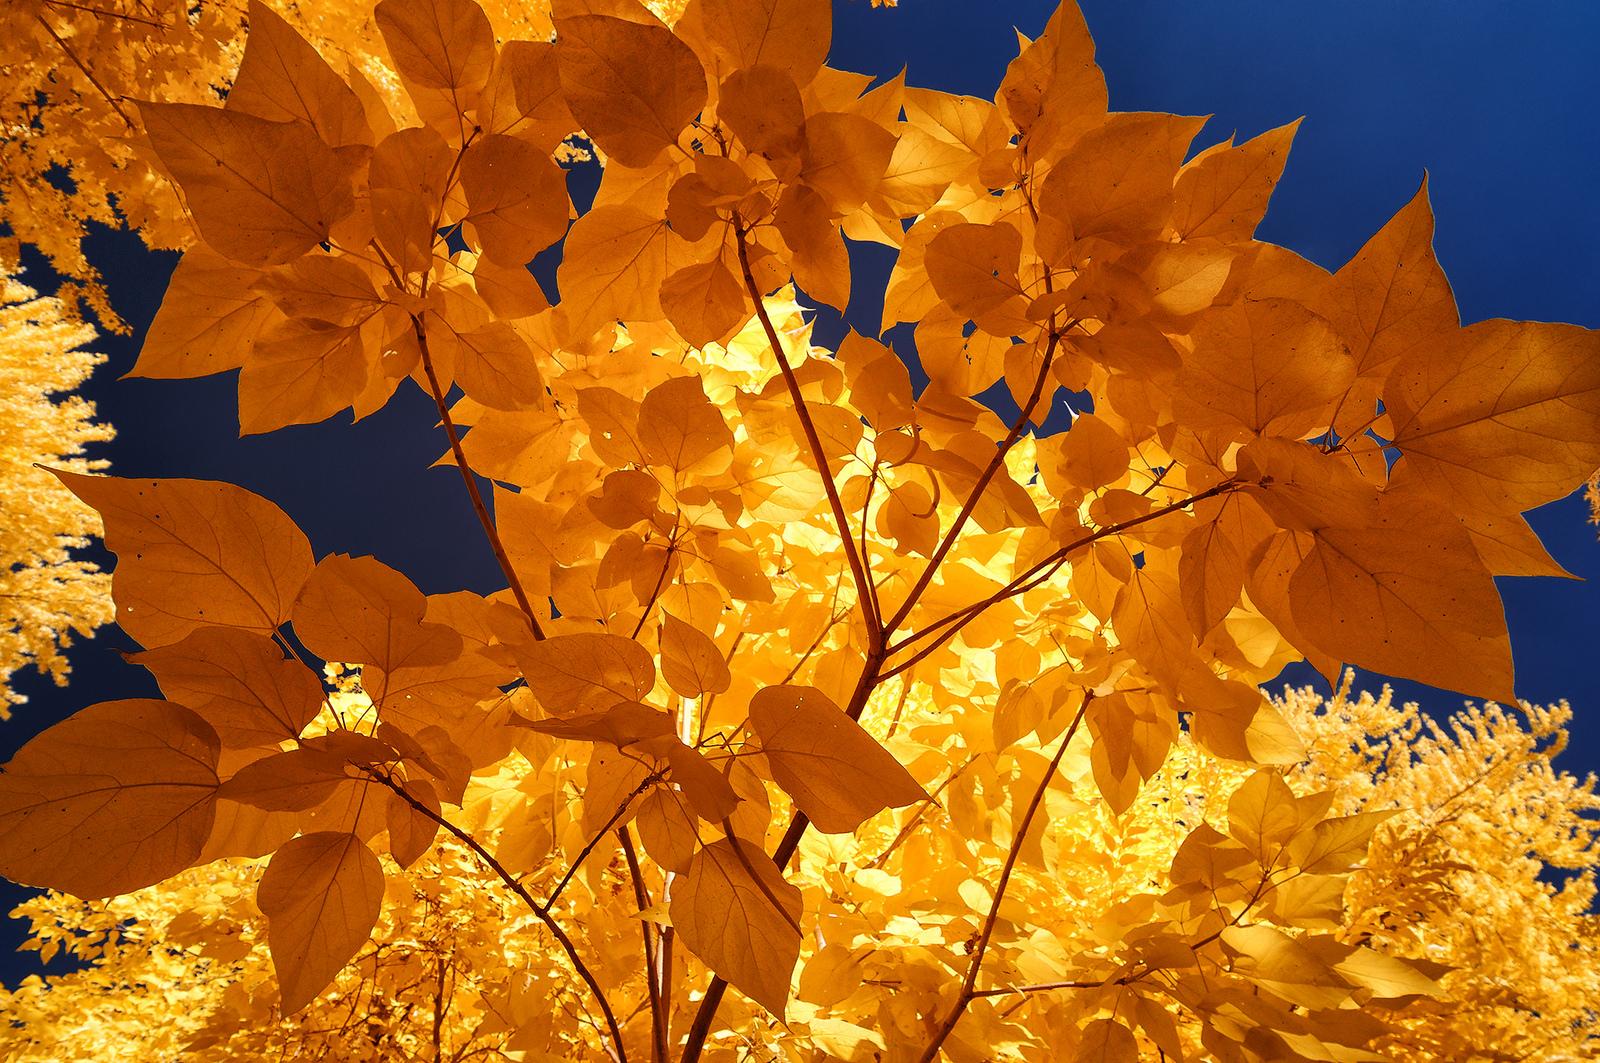 yellow-glory-by-scottie